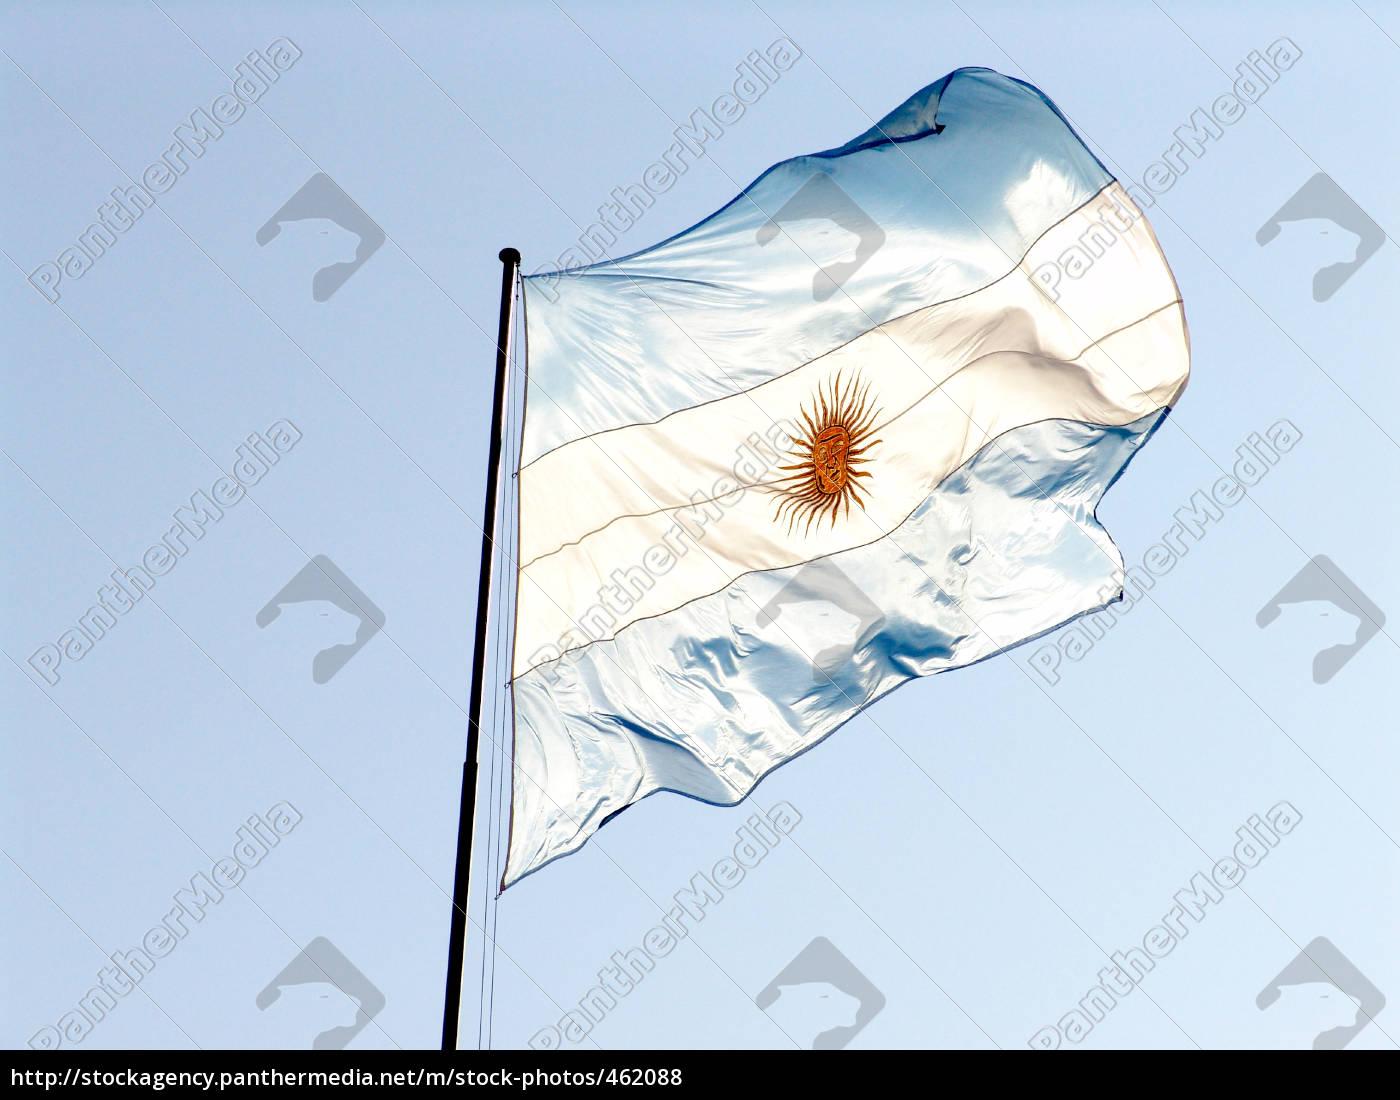 viva, argentina - 462088